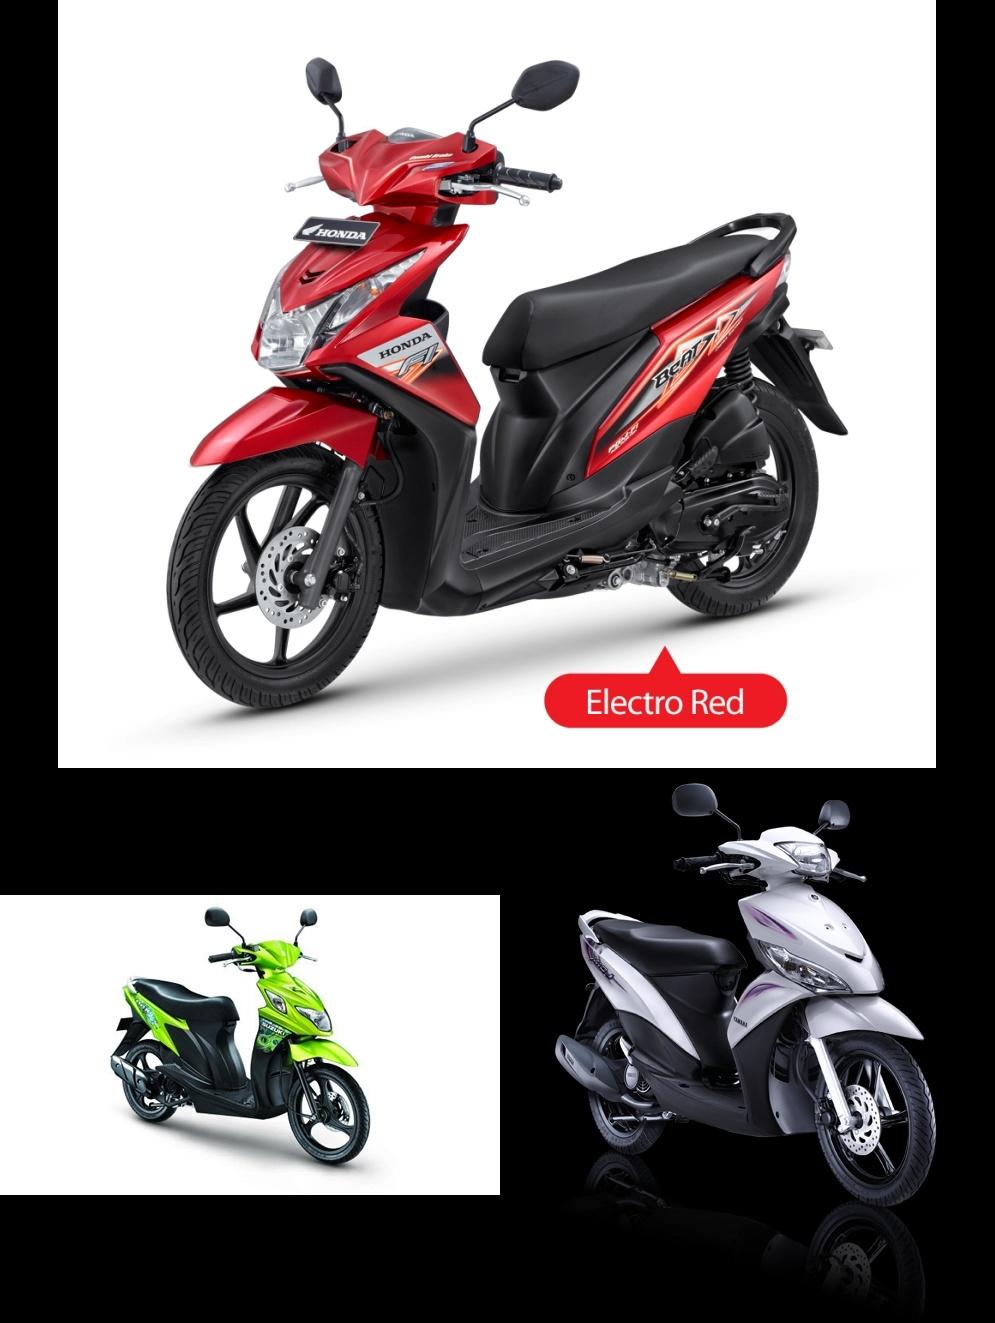 Konsumsi BBM New BeAT vs Mio J vs Nex, Masih Irit New BeAT Tapi.